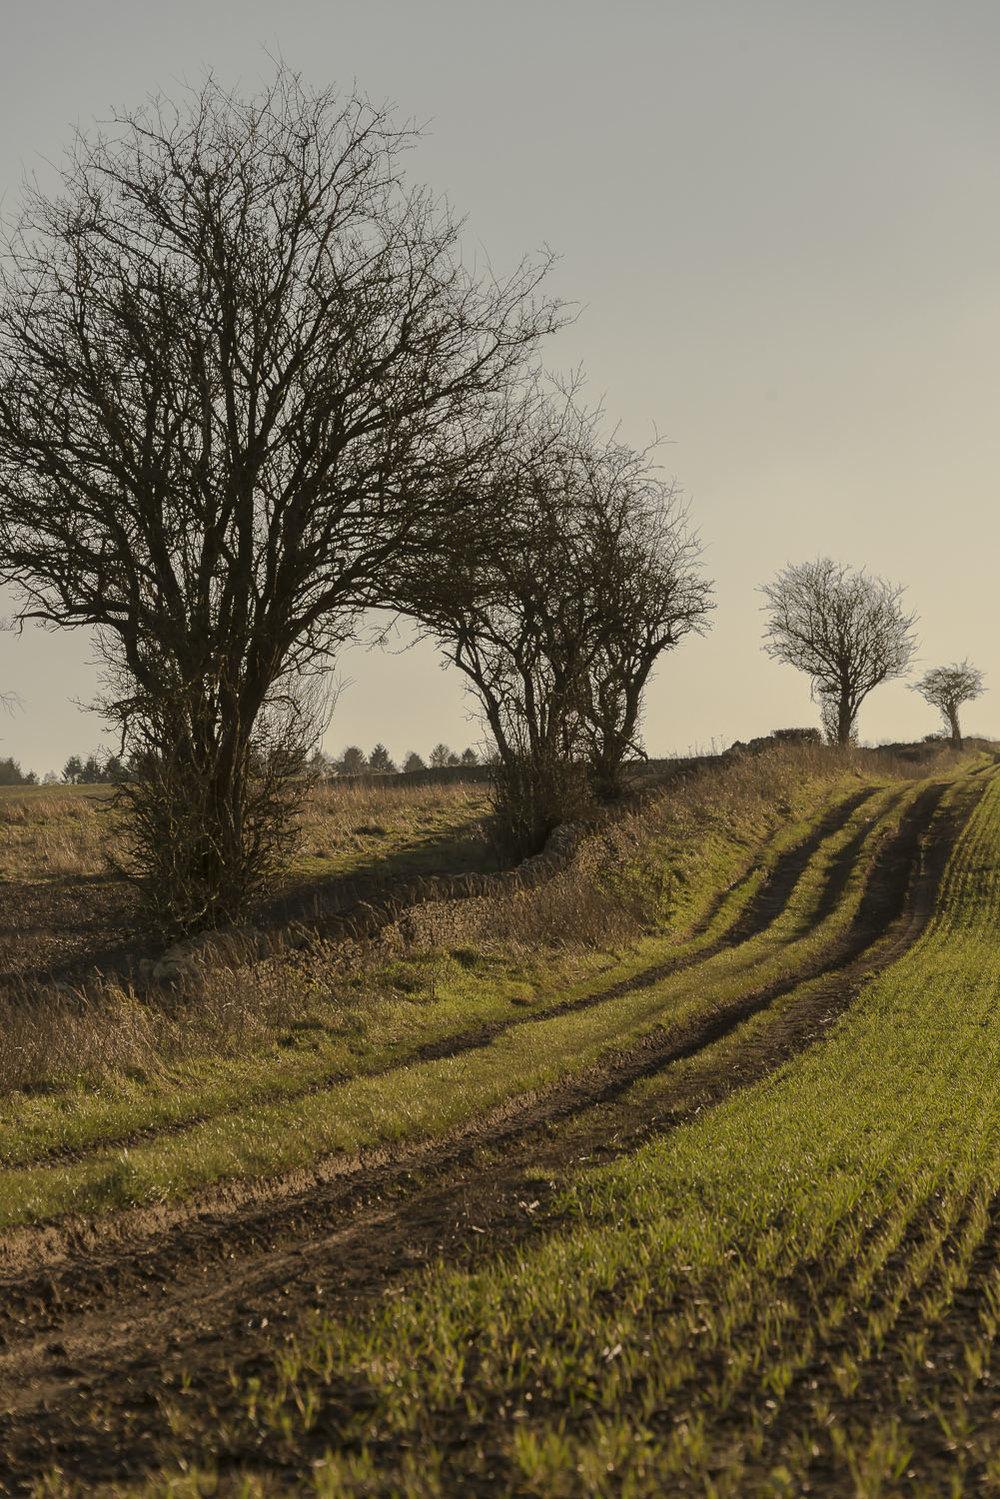 trees-winter-Gloucestershire-Jo-Kearney-photos-landscape-photography-video-landscapes.jpg